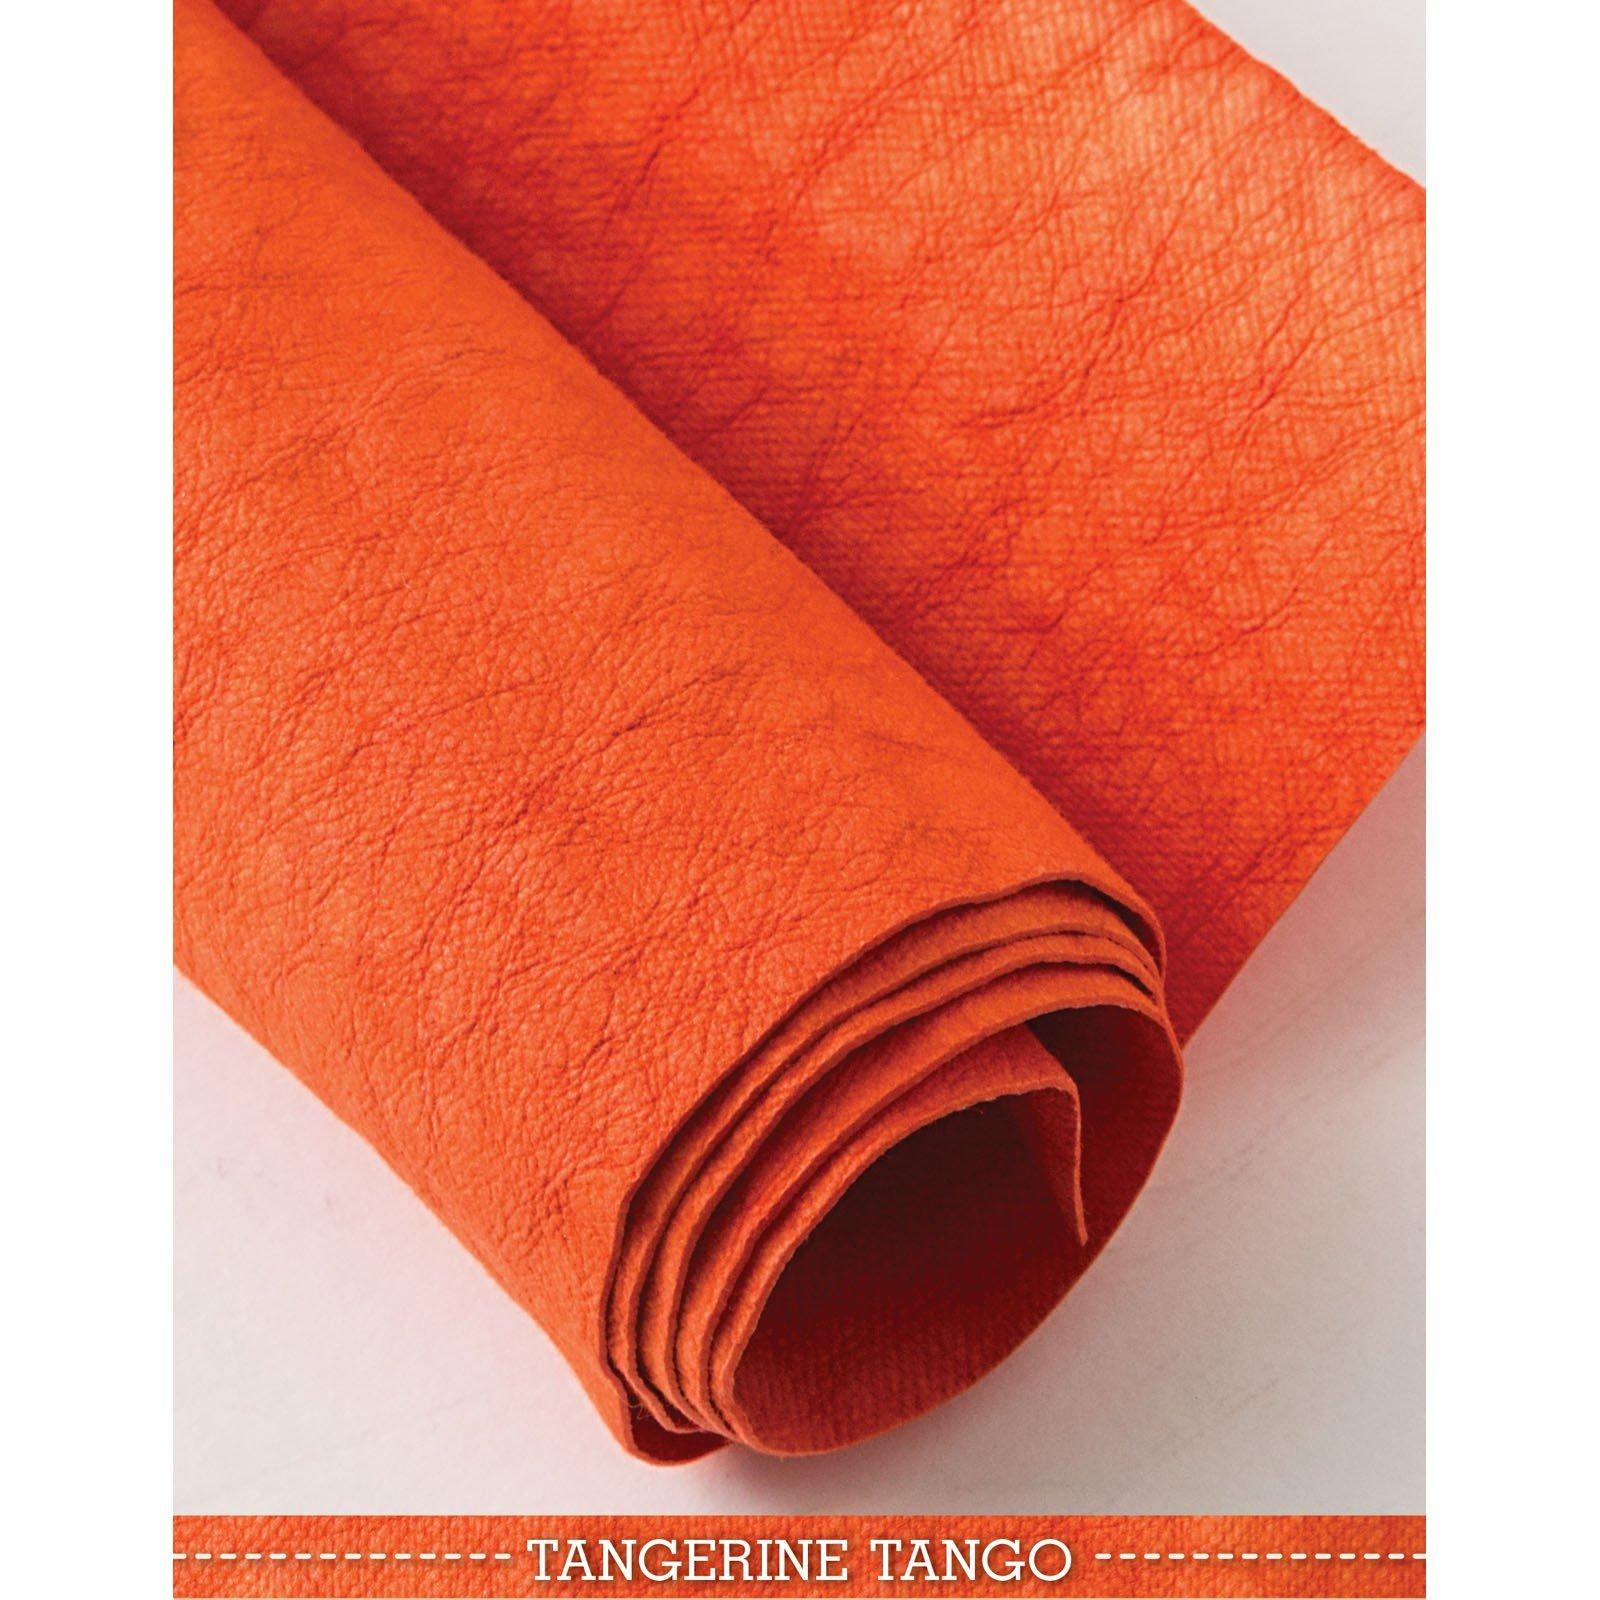 Tangerine Tango Kraft-Tex Designer Paper Fabric - approx. 18 x 28 - prewashed - CTP20386